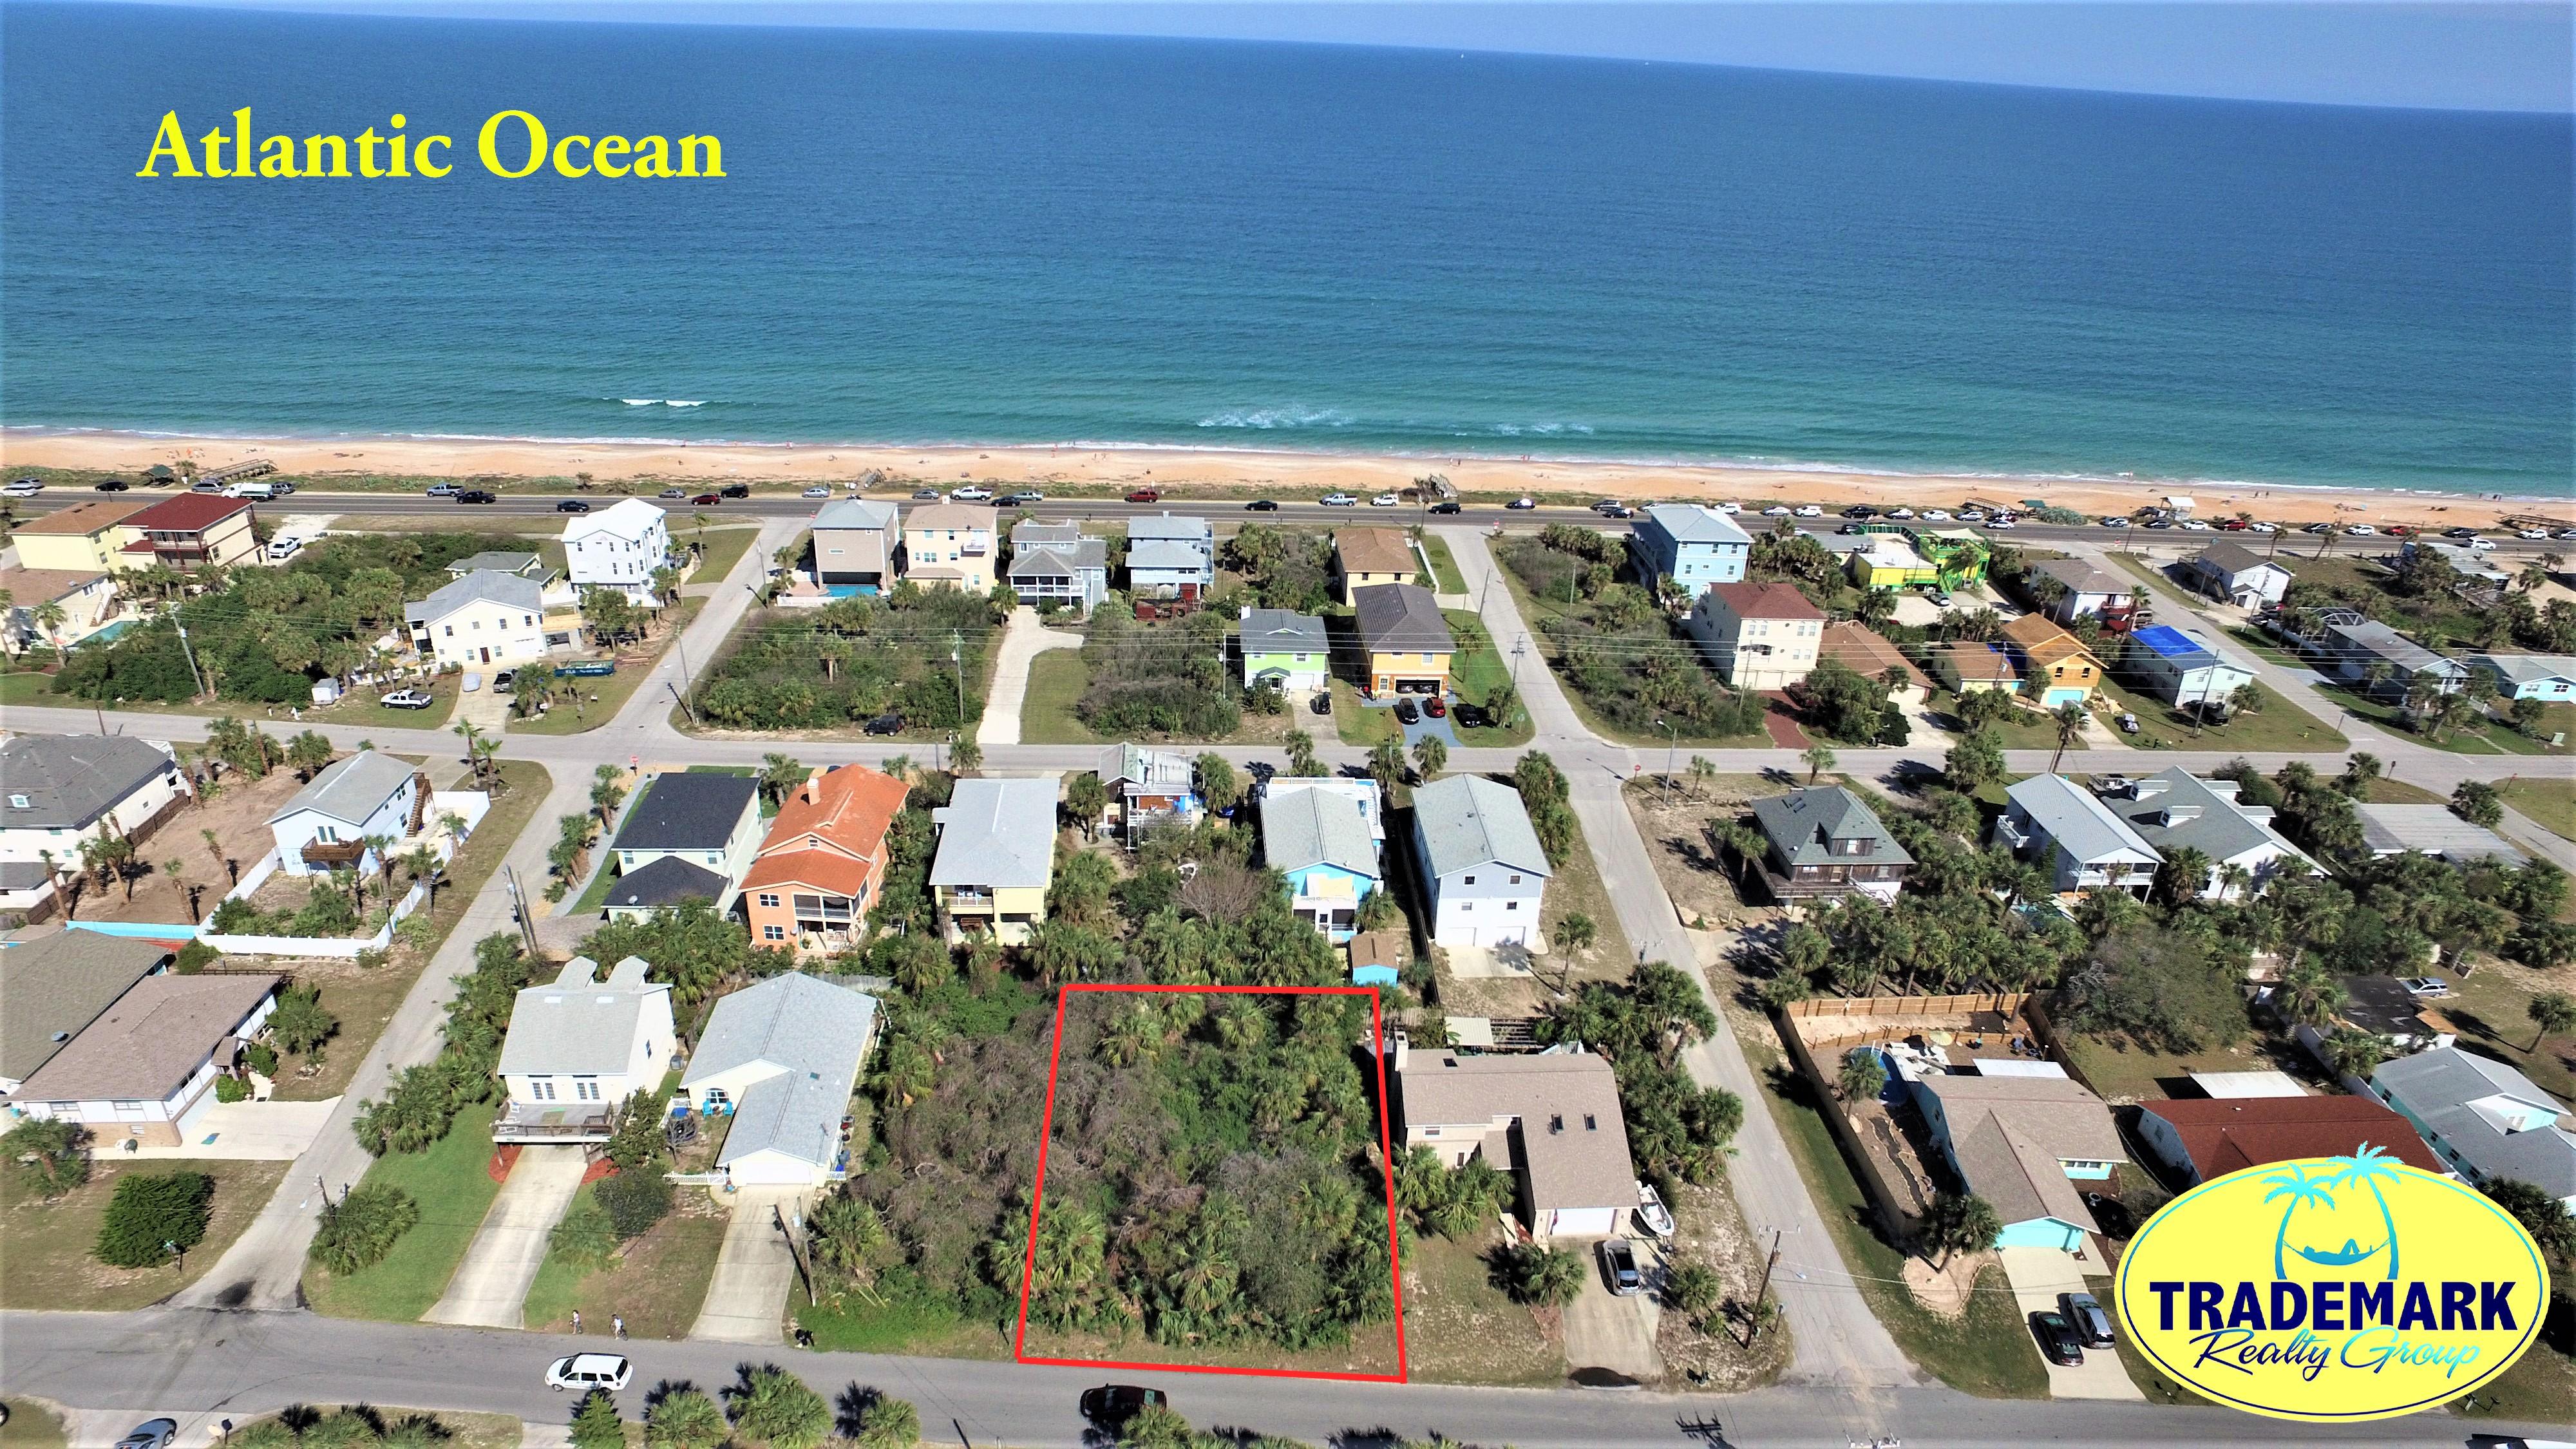 1102 N. Dayton Ave Flagler Beach FL